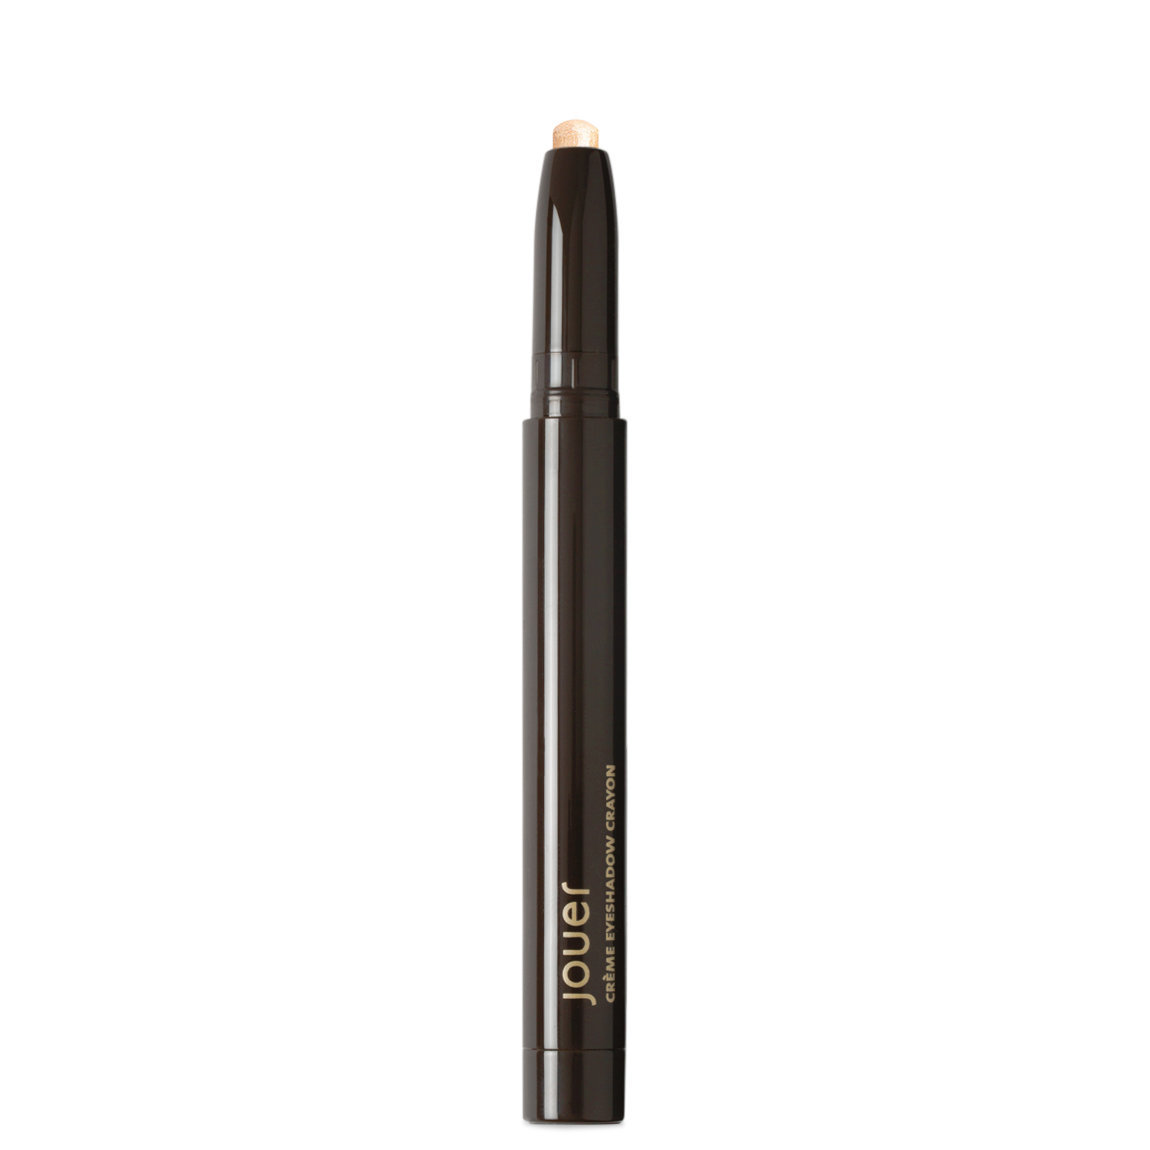 Jouer Cosmetics Crème Eyeshadow Crayon Regency alternative view 1.